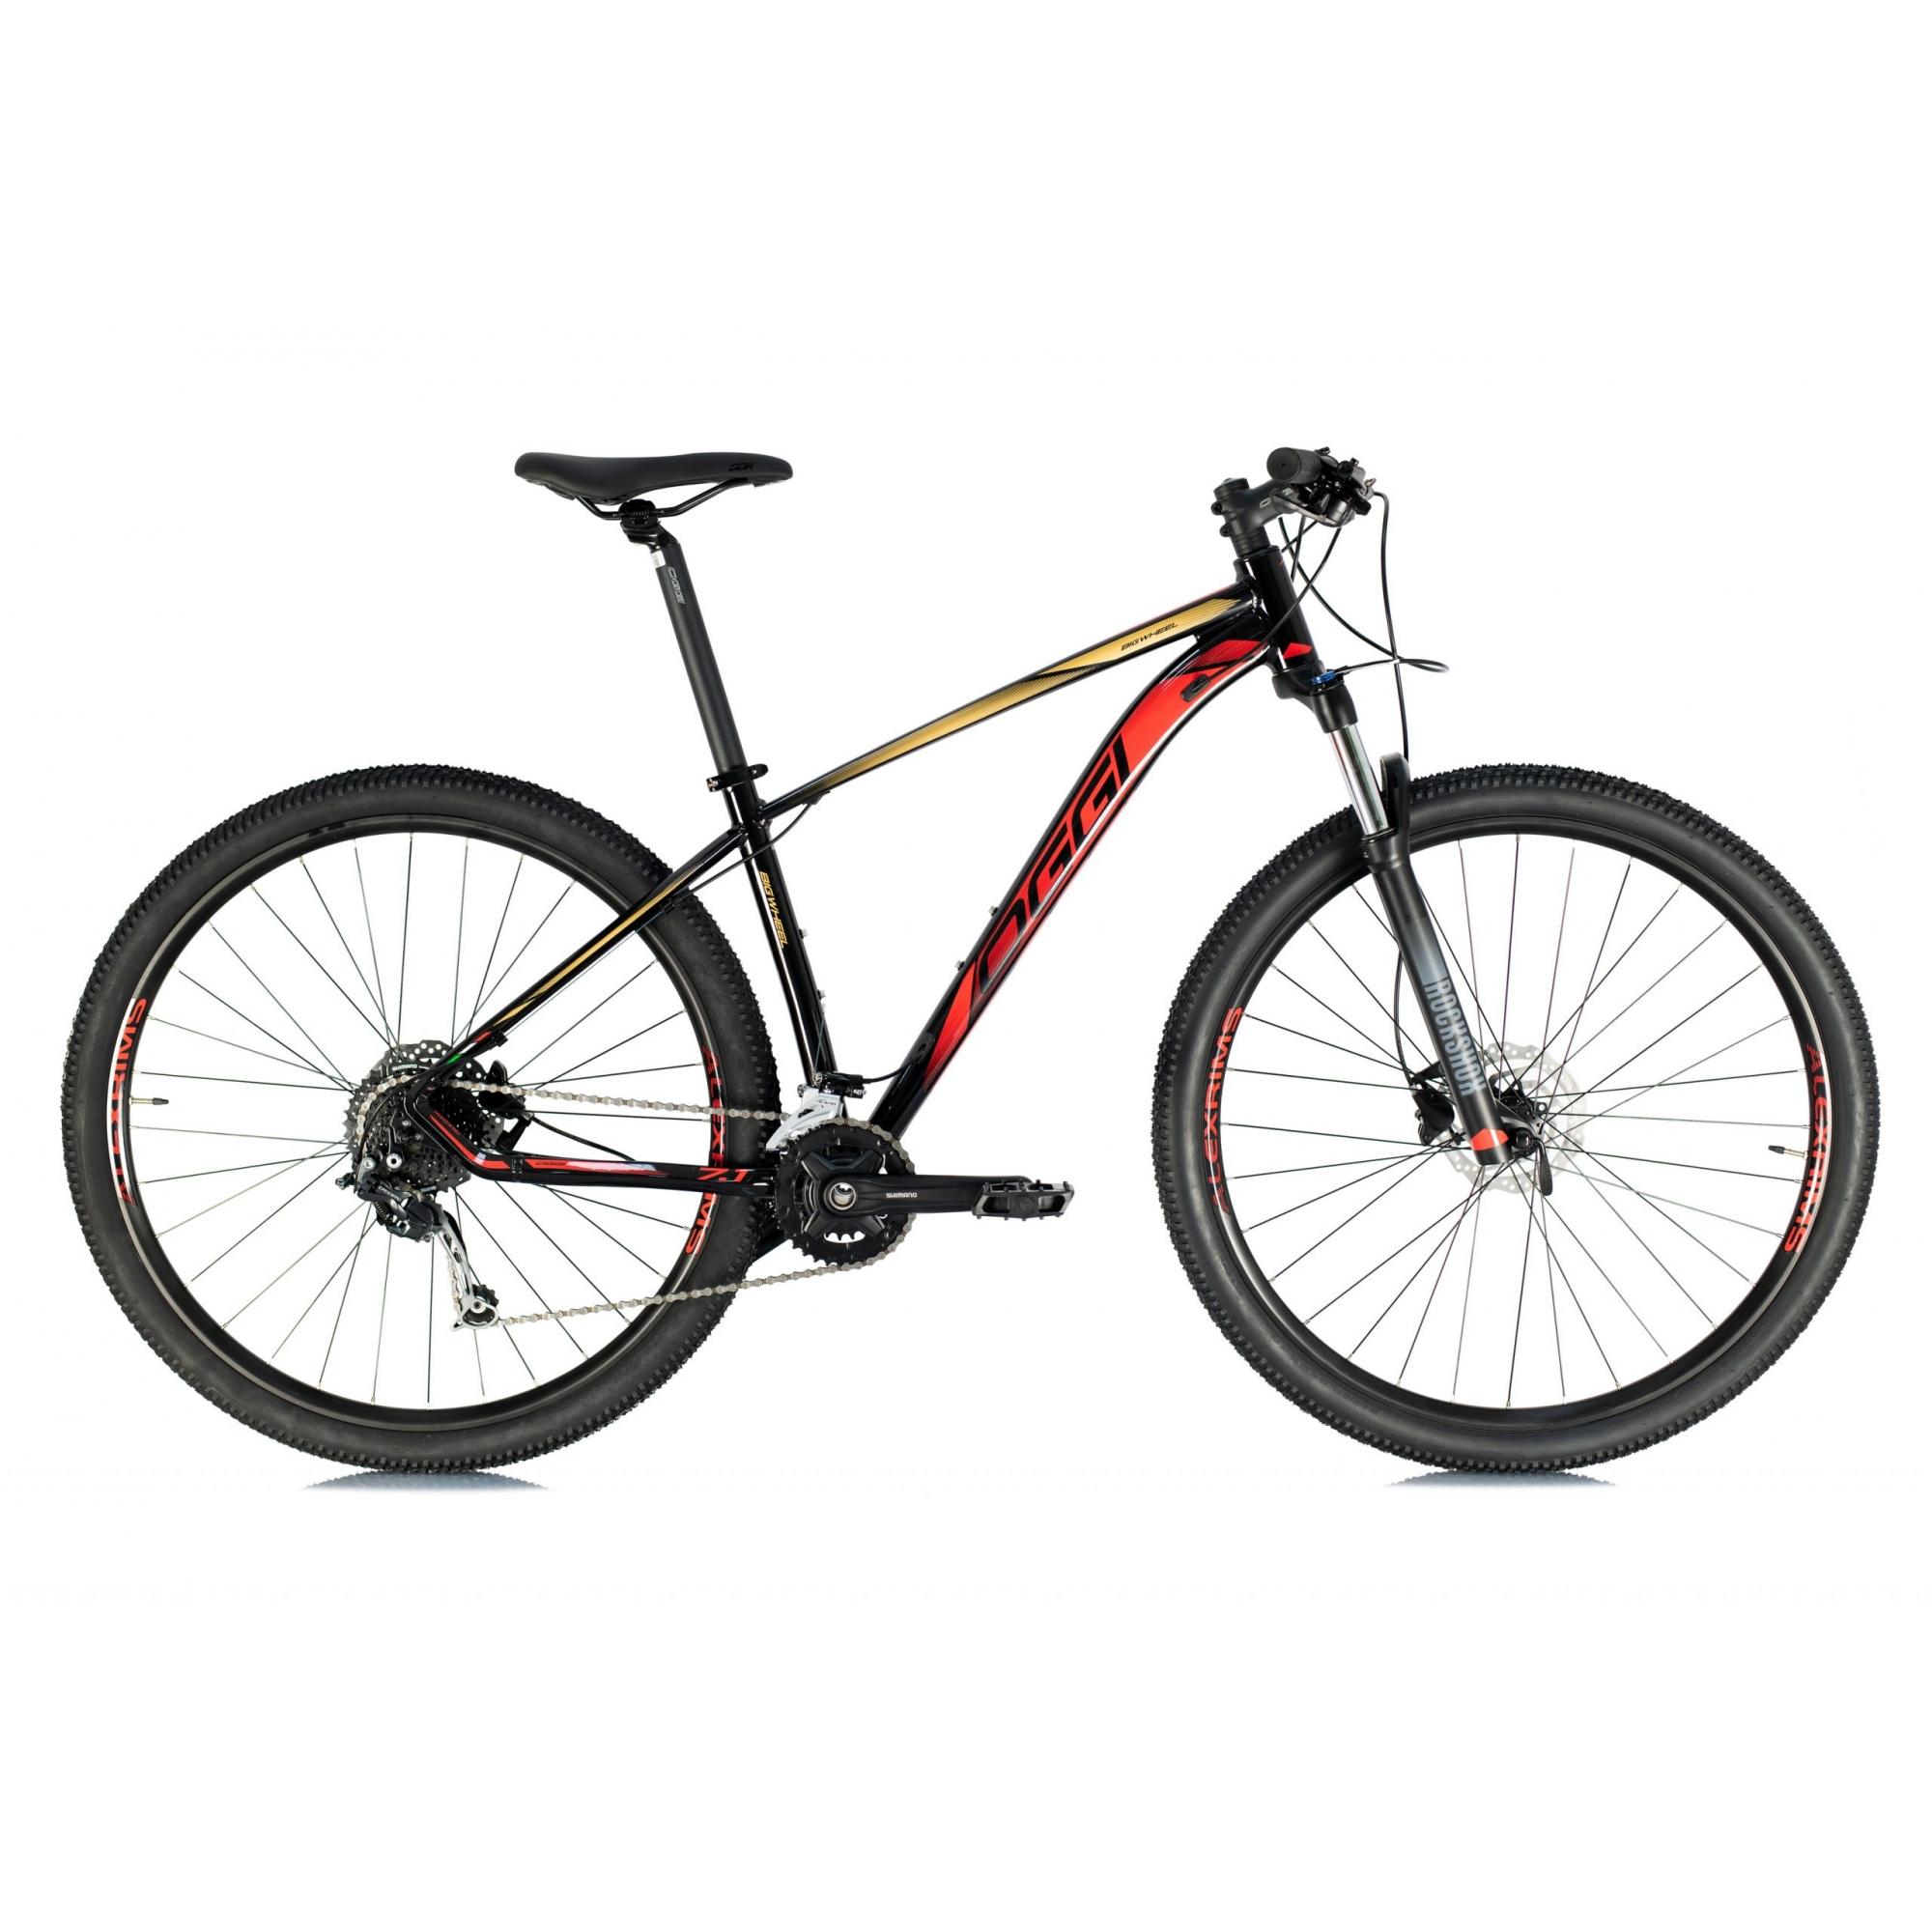 Bicicleta aro 29 Oggi Big Wheel 7.1 Alivio 18 Velocidades